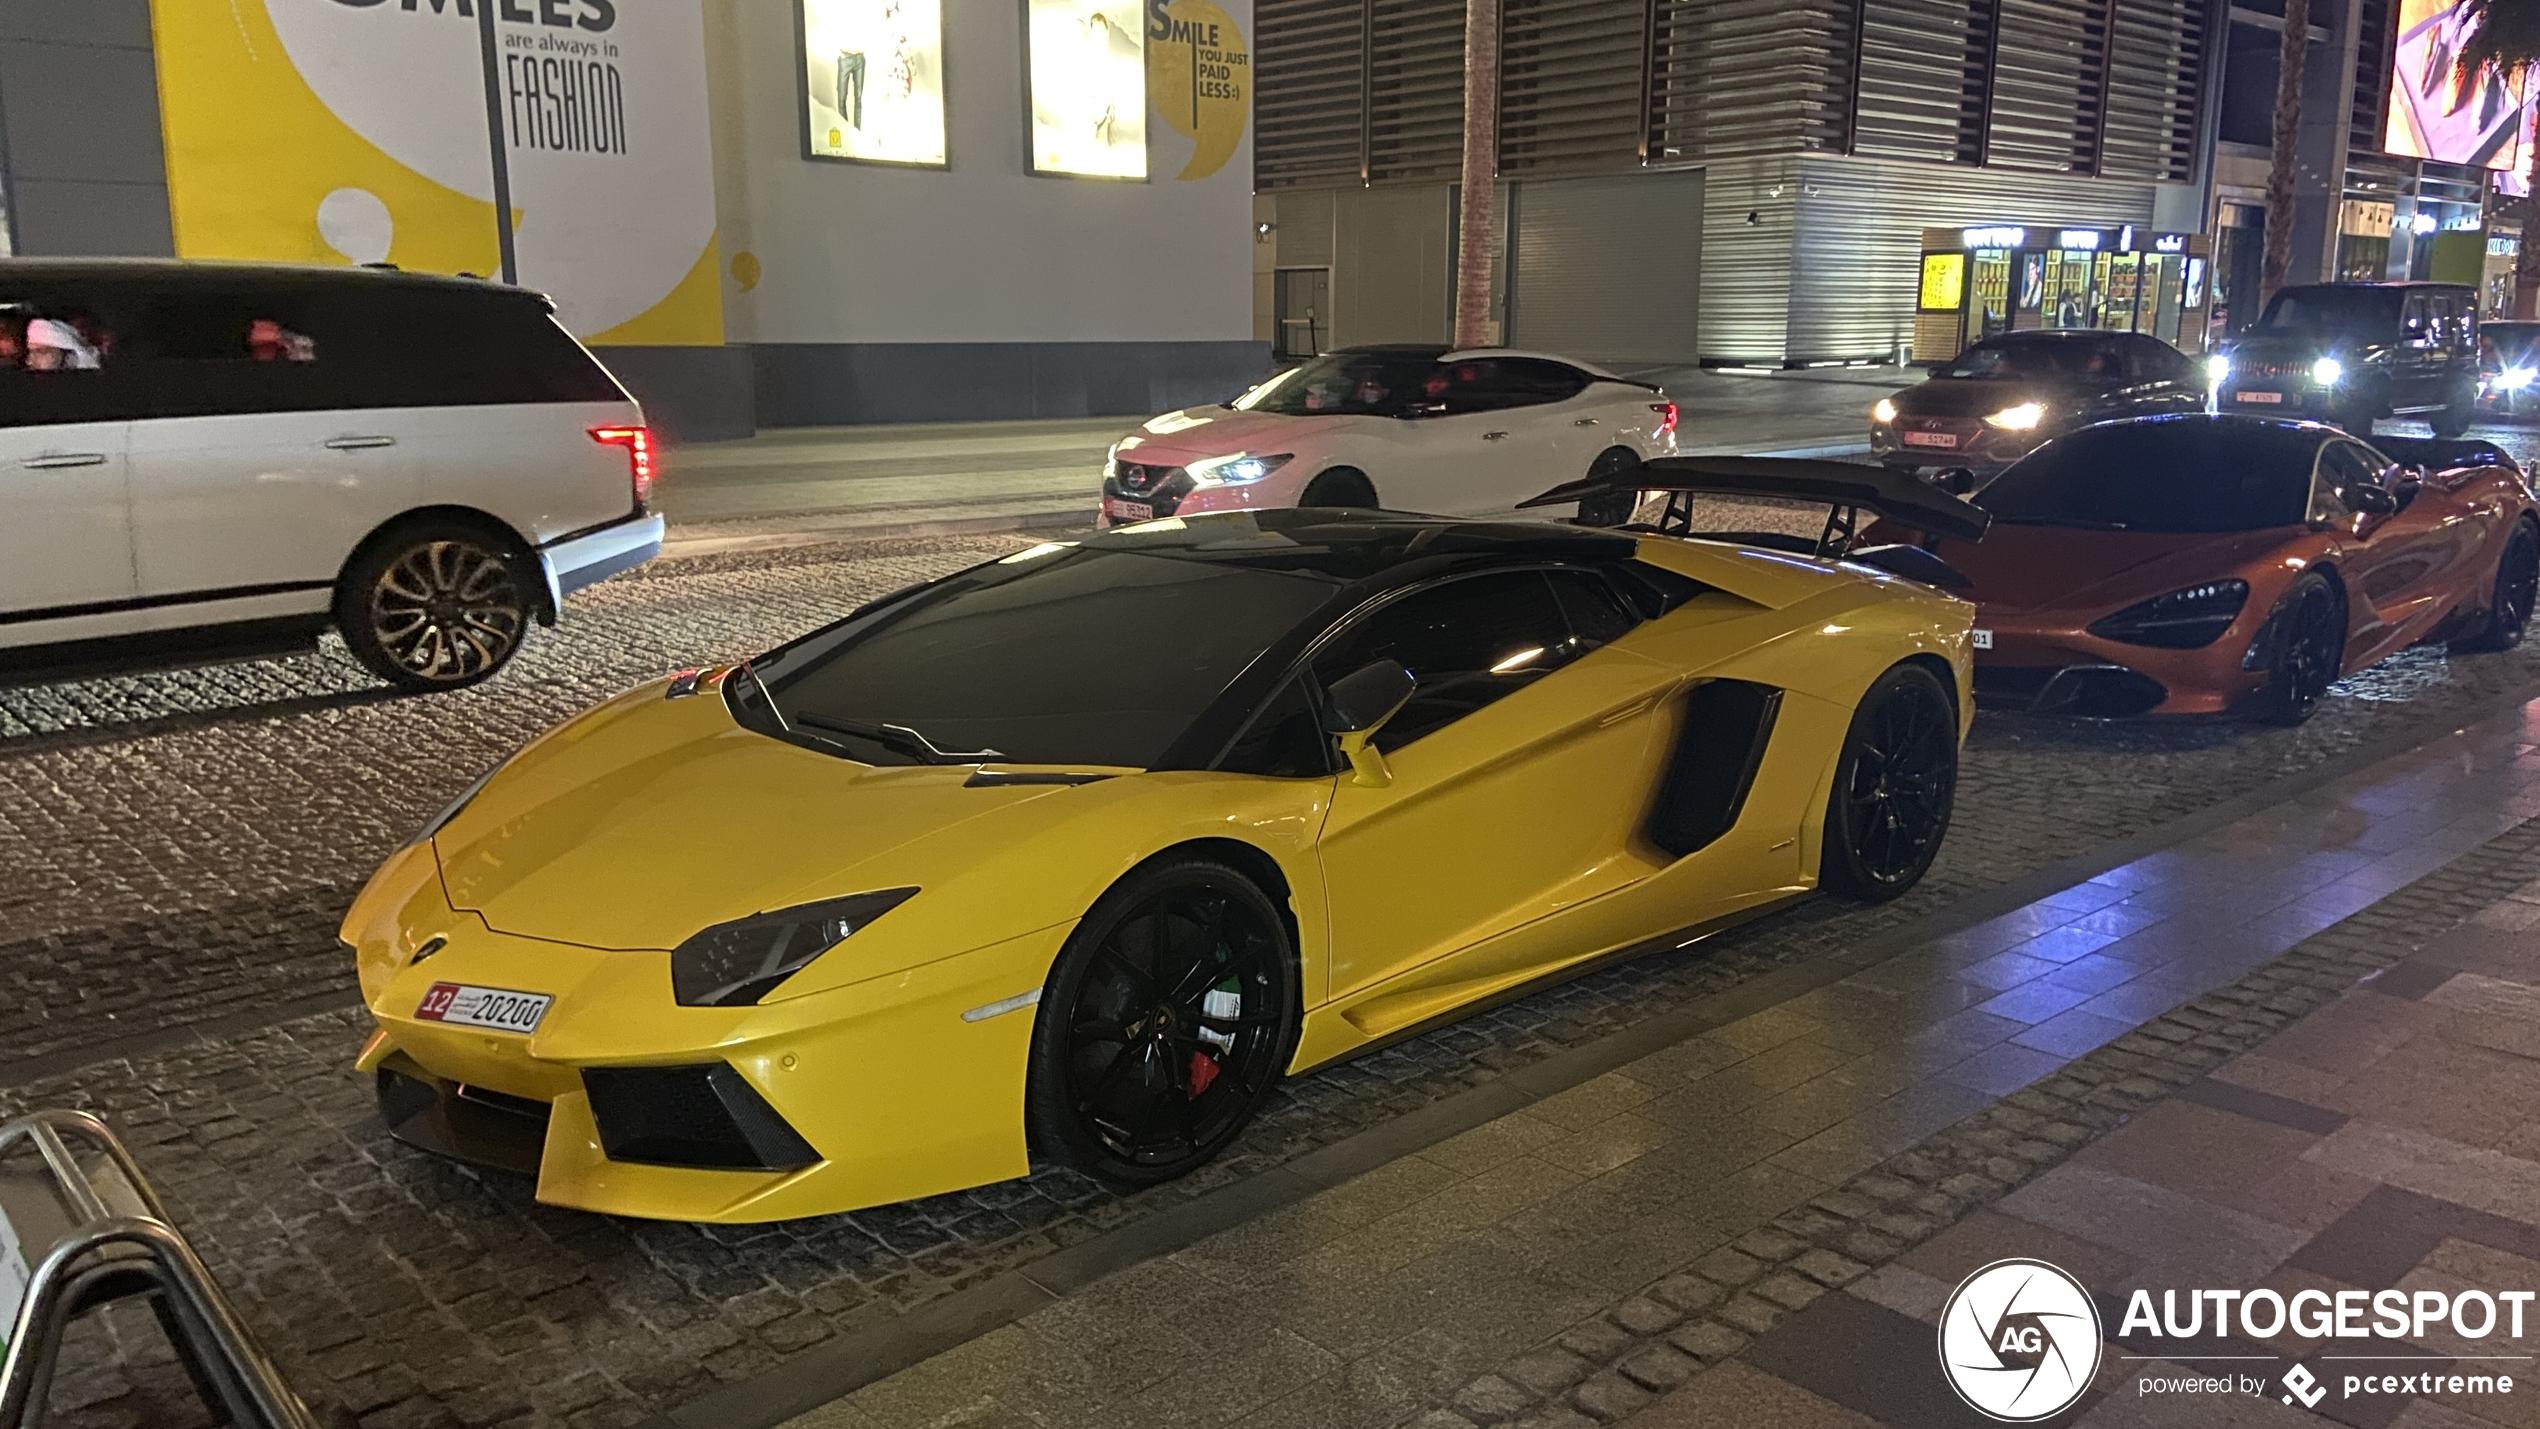 LamborghiniAventador LP700-4